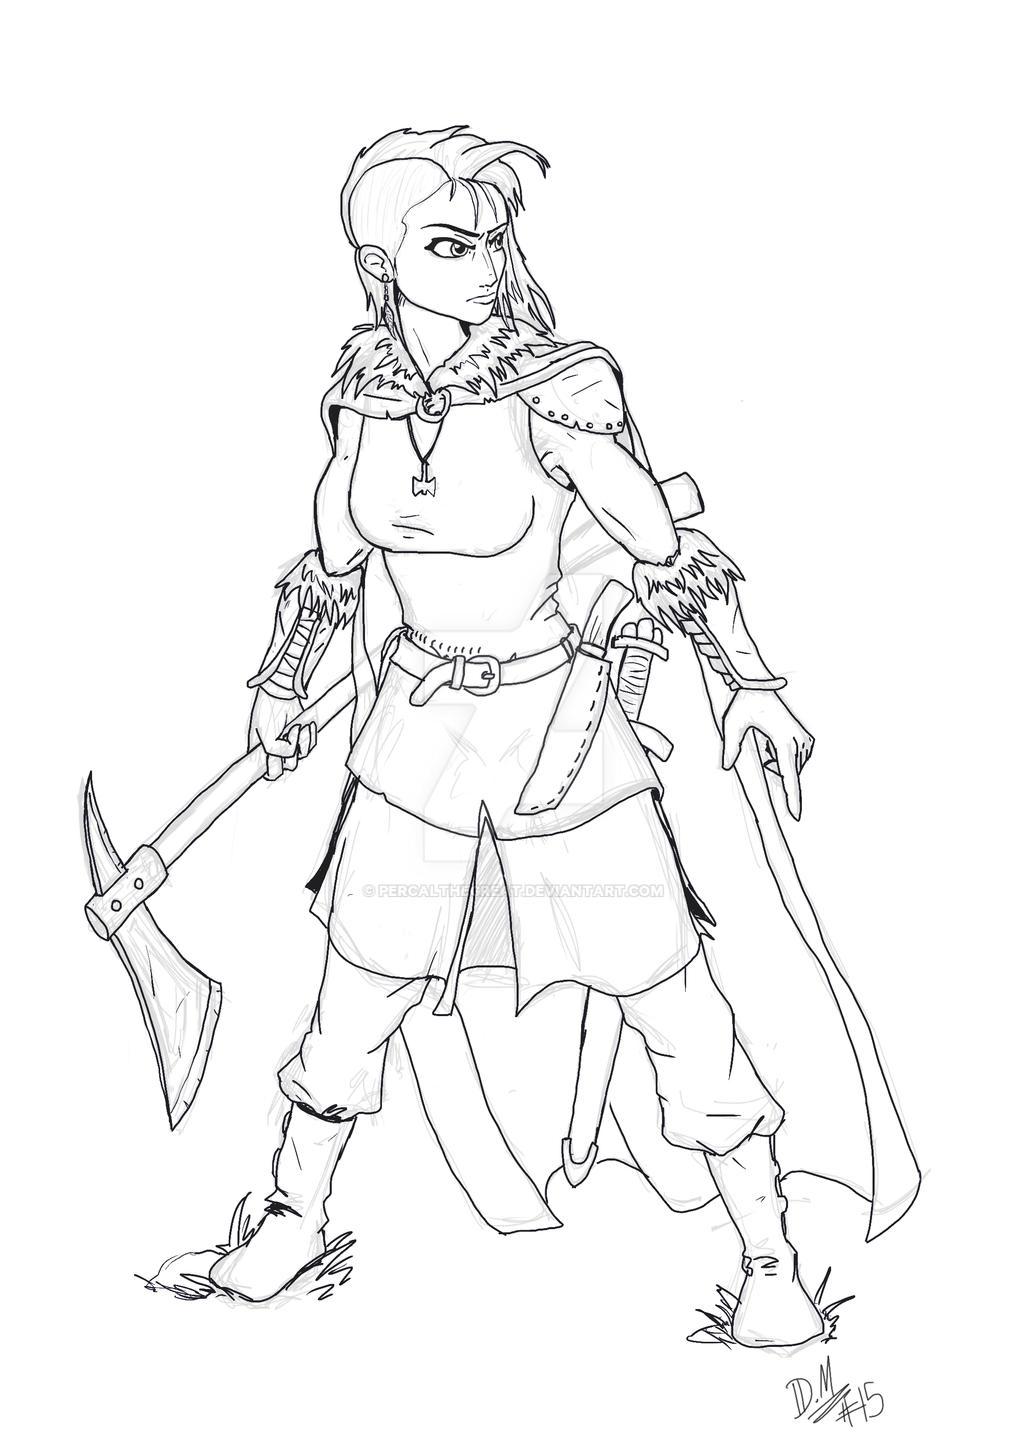 Female viking warrior. by PercalTheGreat on DeviantArt